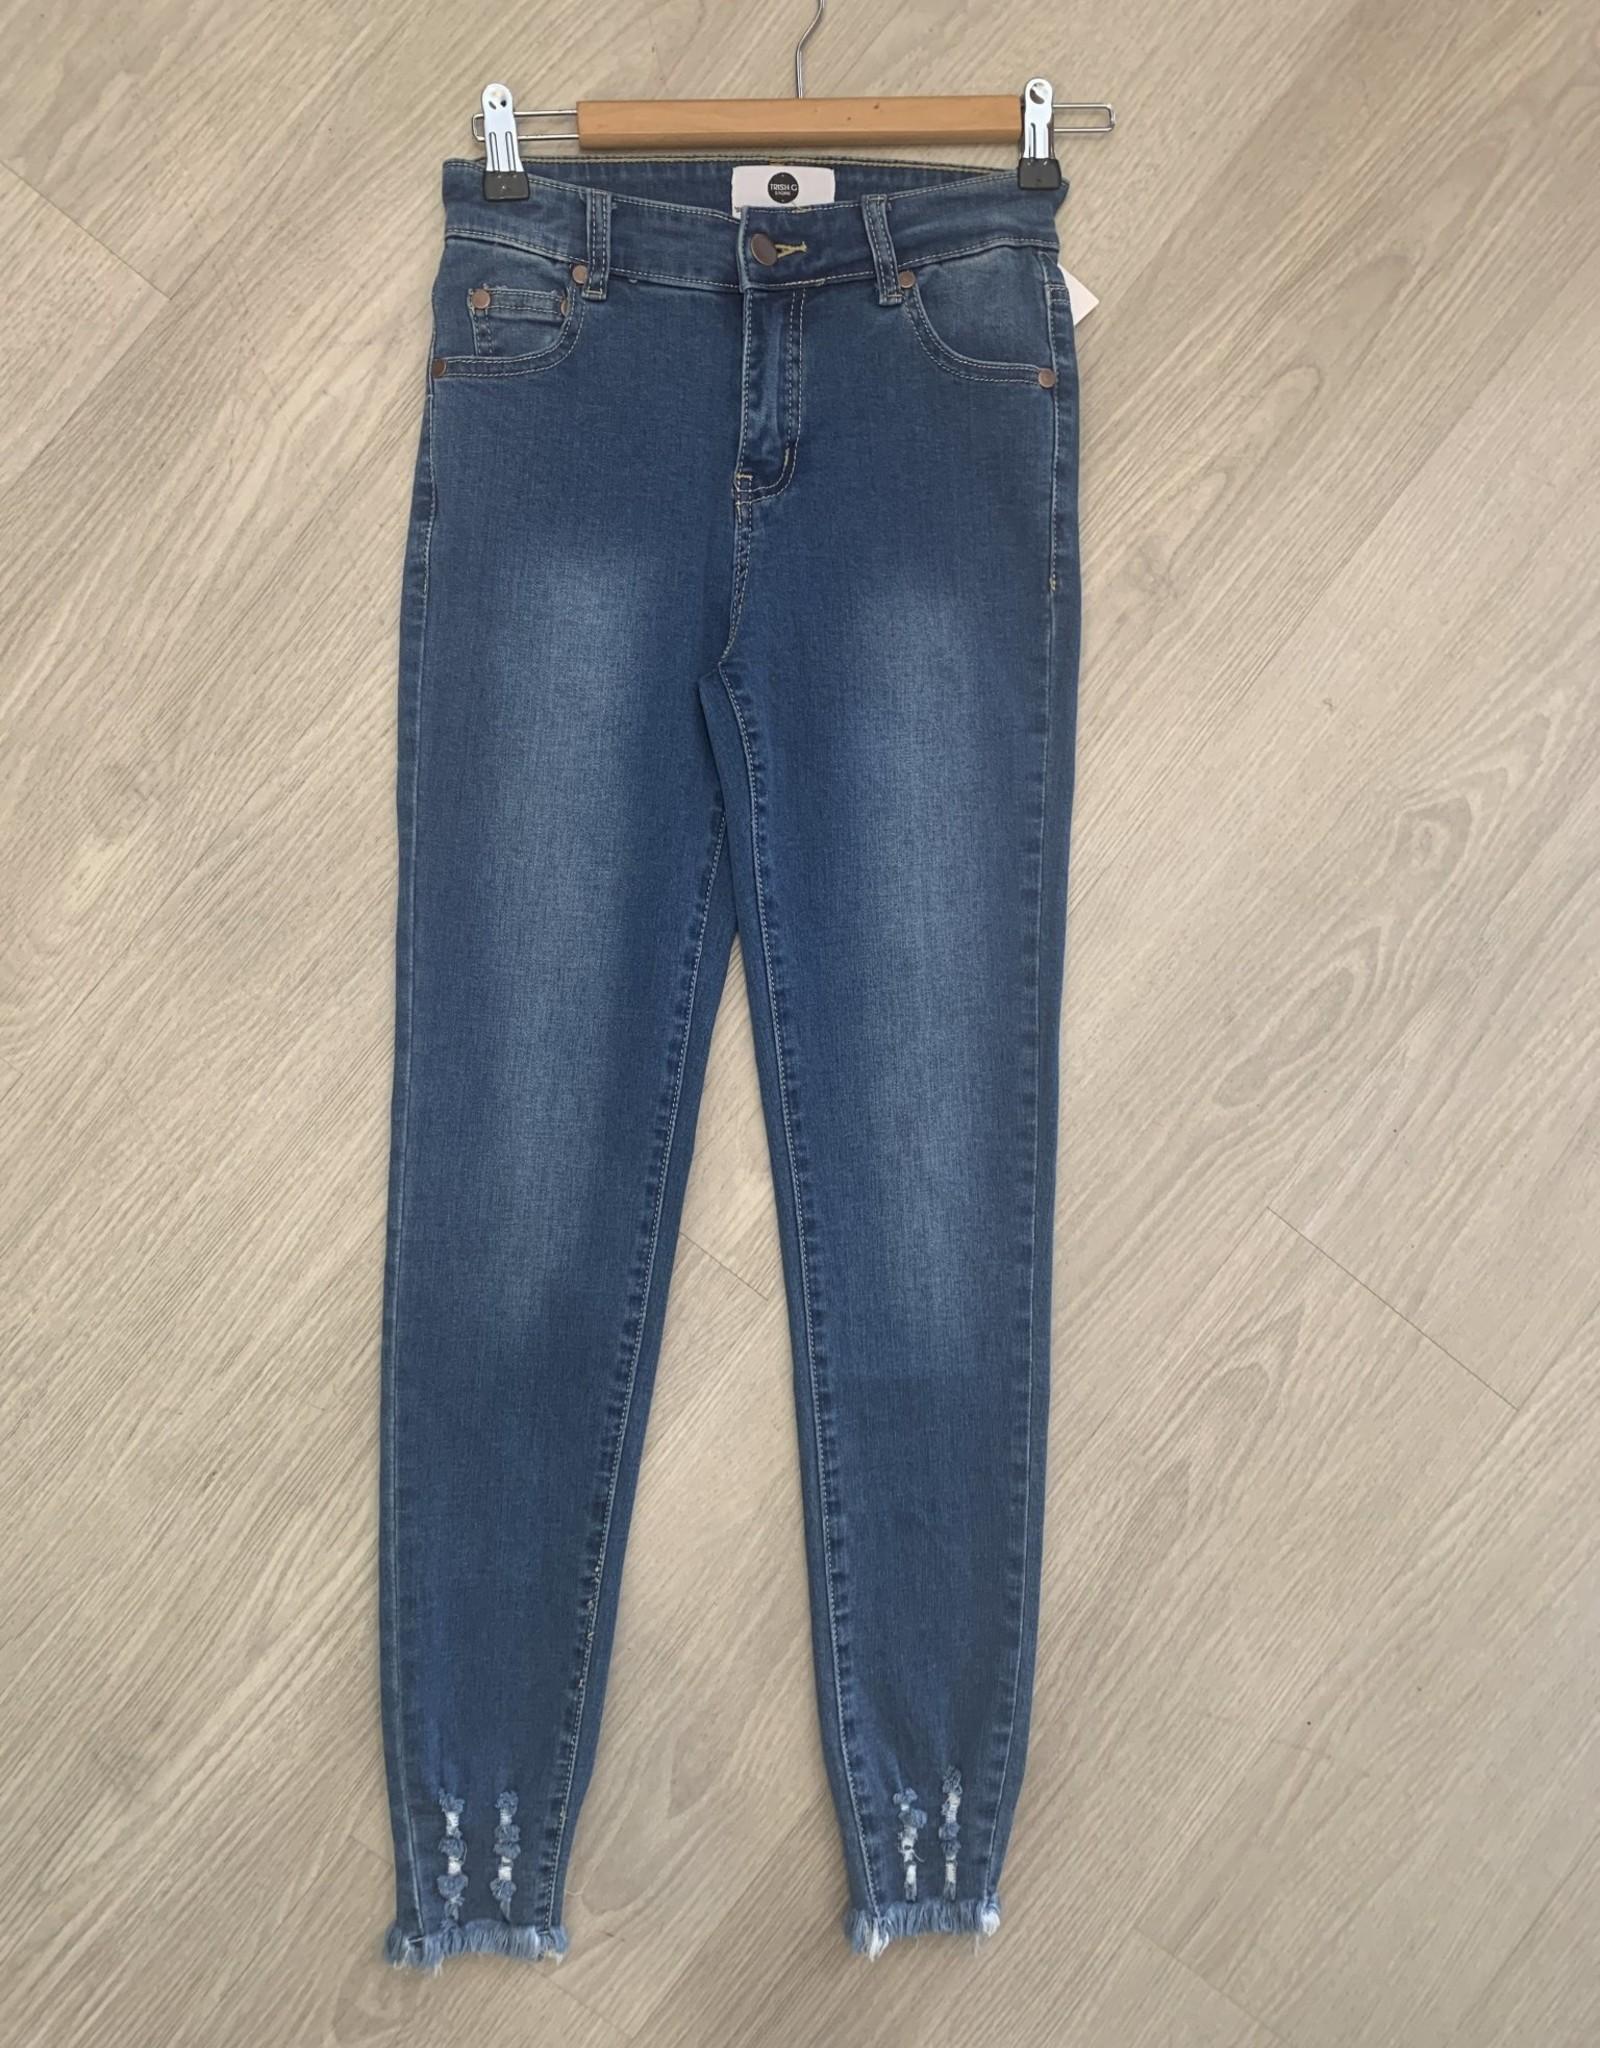 Wakee - Onyx Denim Jeans with Frayed Botton